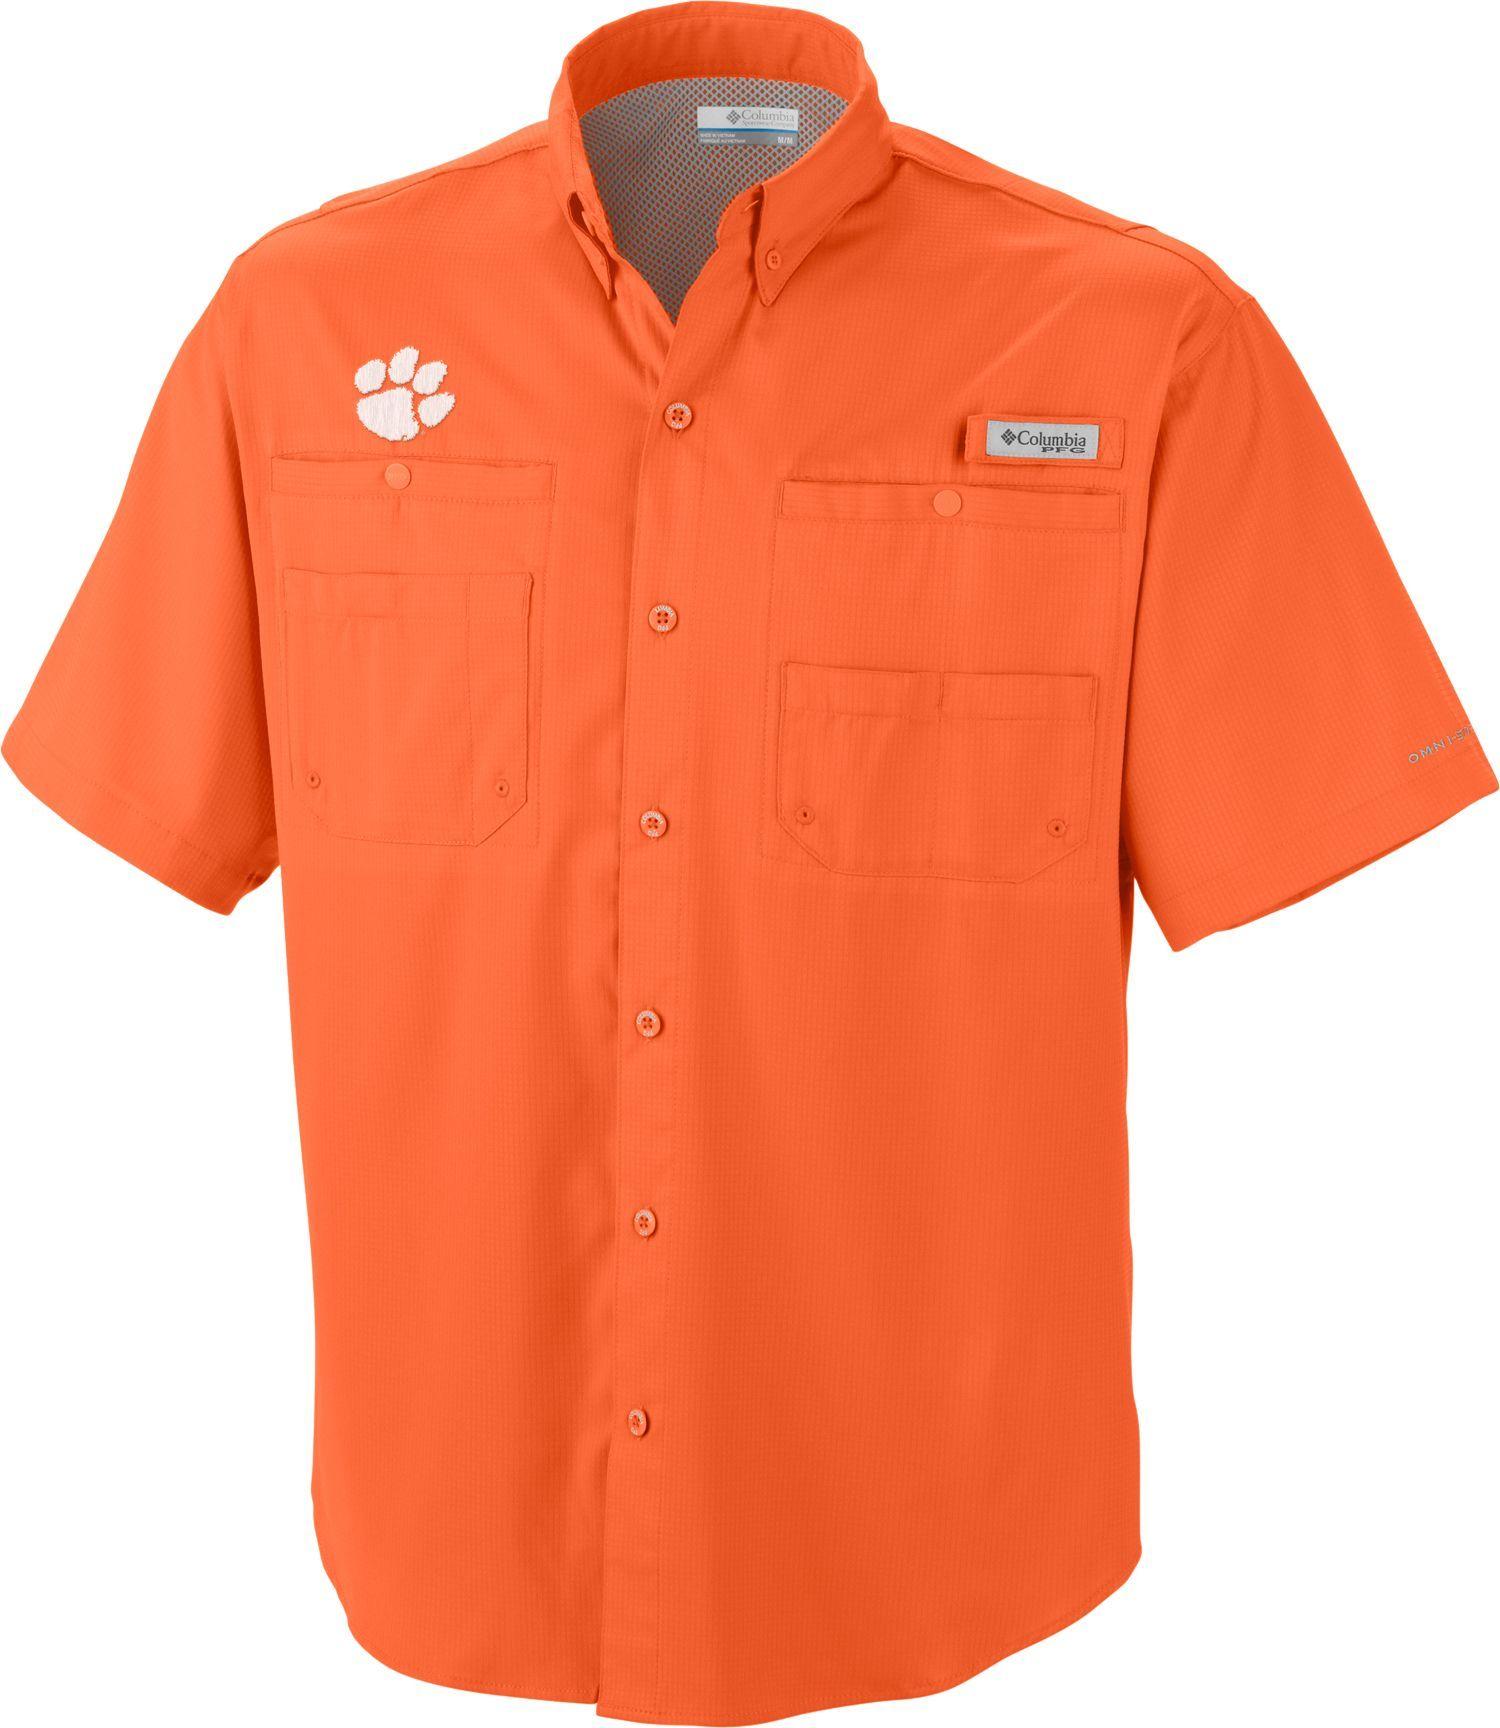 7e1d5d8fec5 Columbia Men's Clemson Tigers Orange Tamiami Performance Shirt, Size: XXL